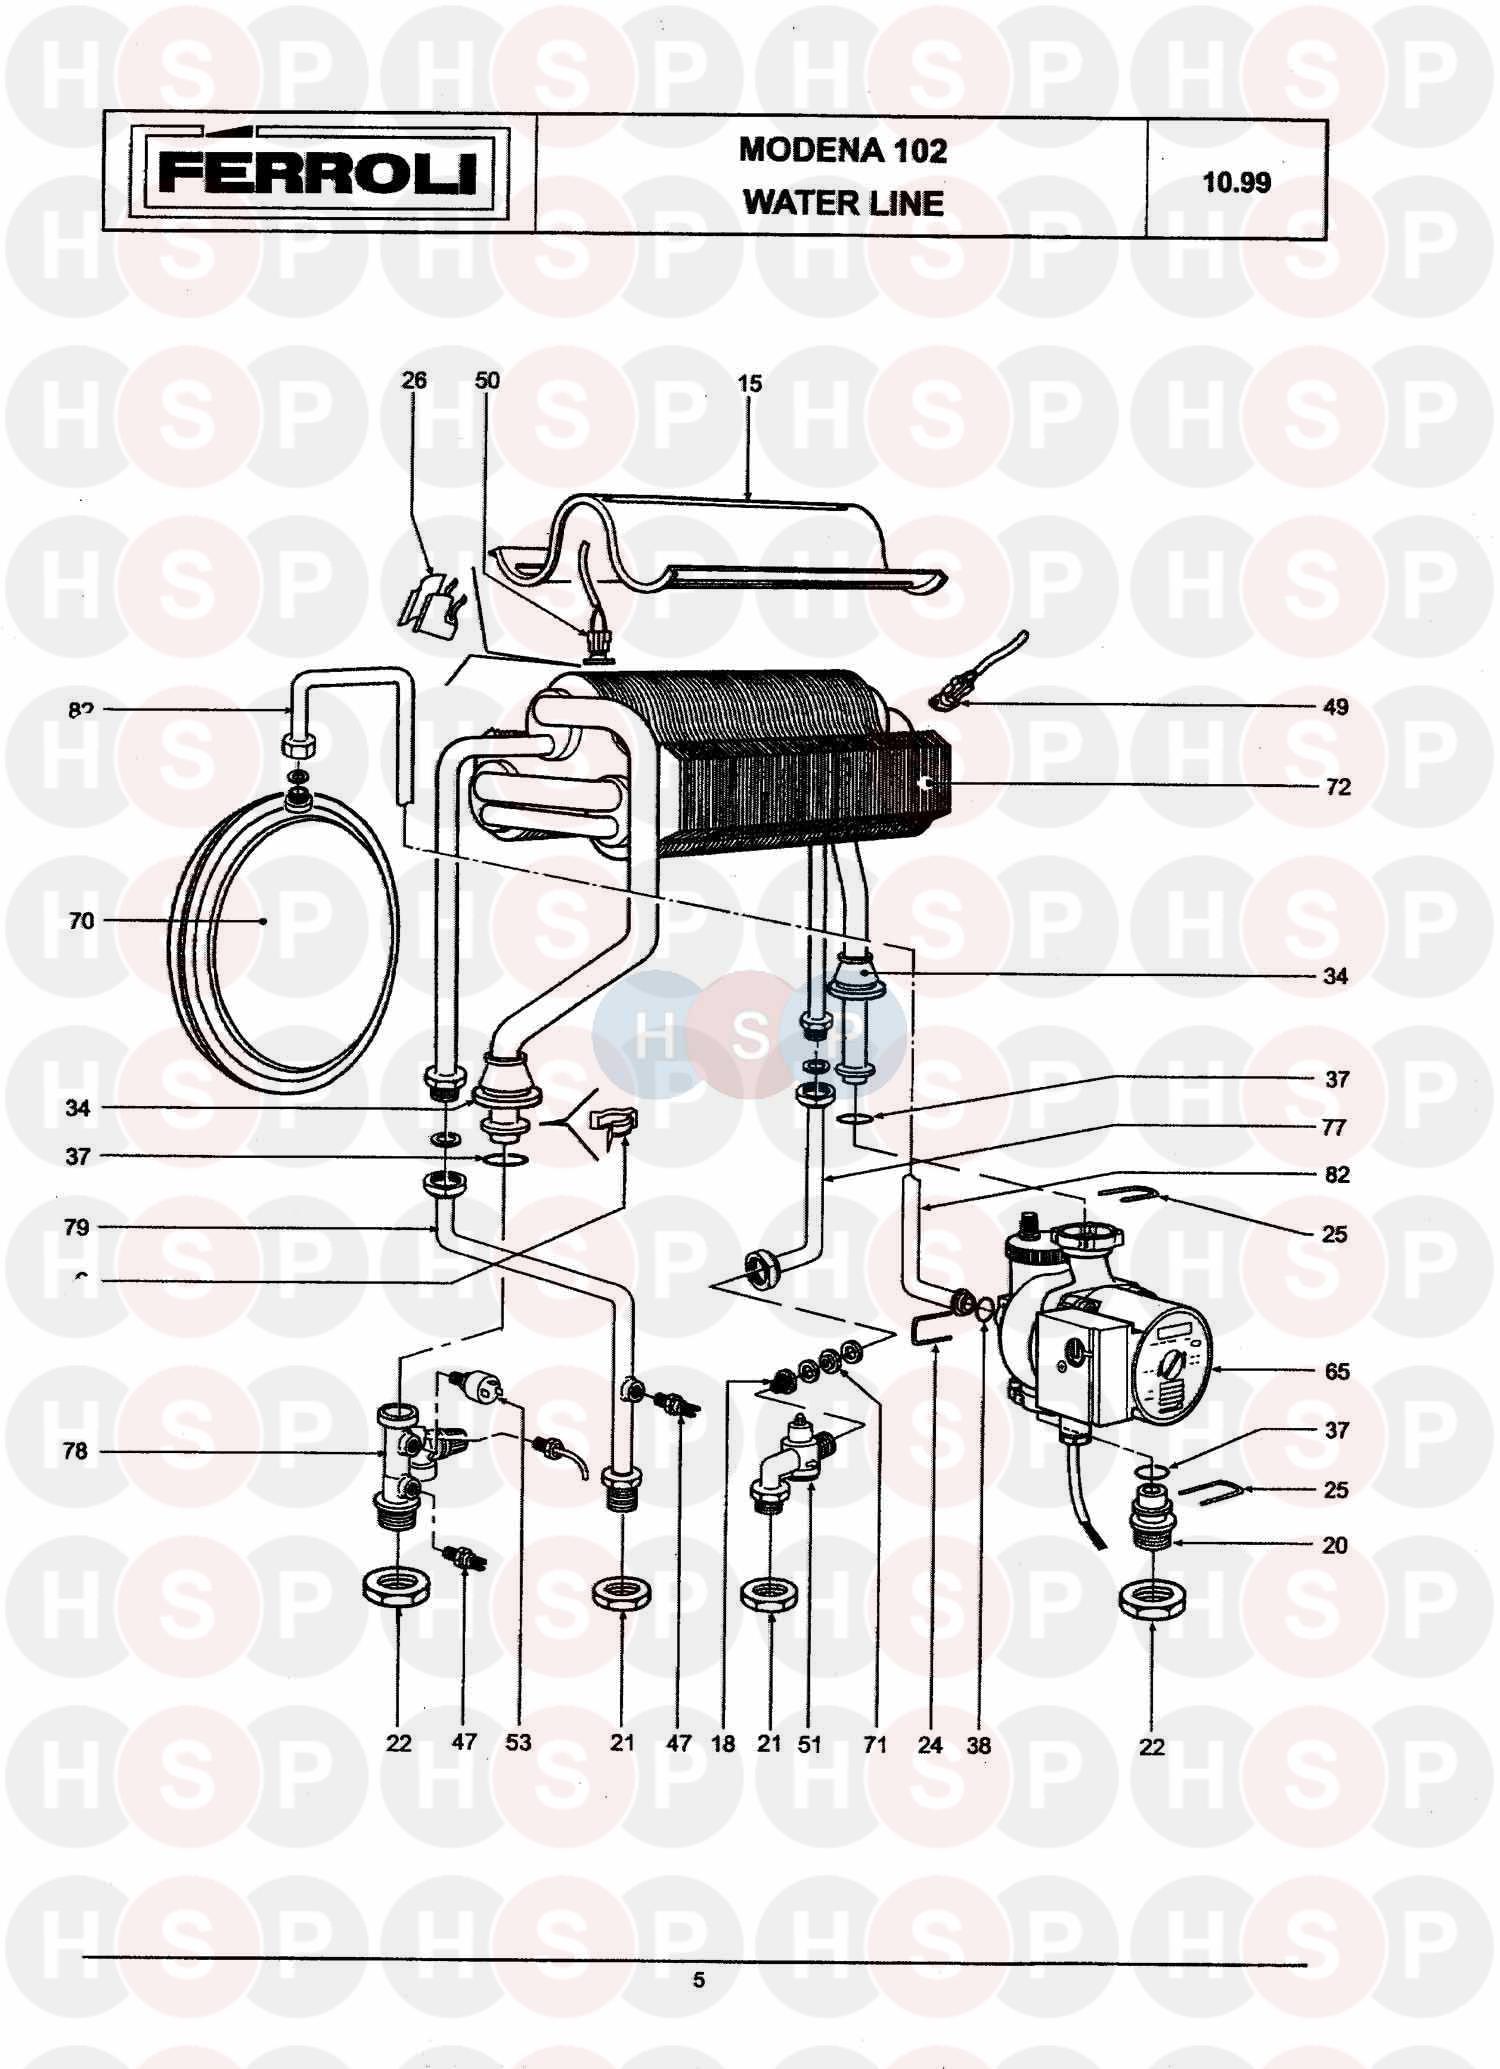 Ferroli MODENA 102 (HEAT EXCHANGER & CONTROLS) Diagram